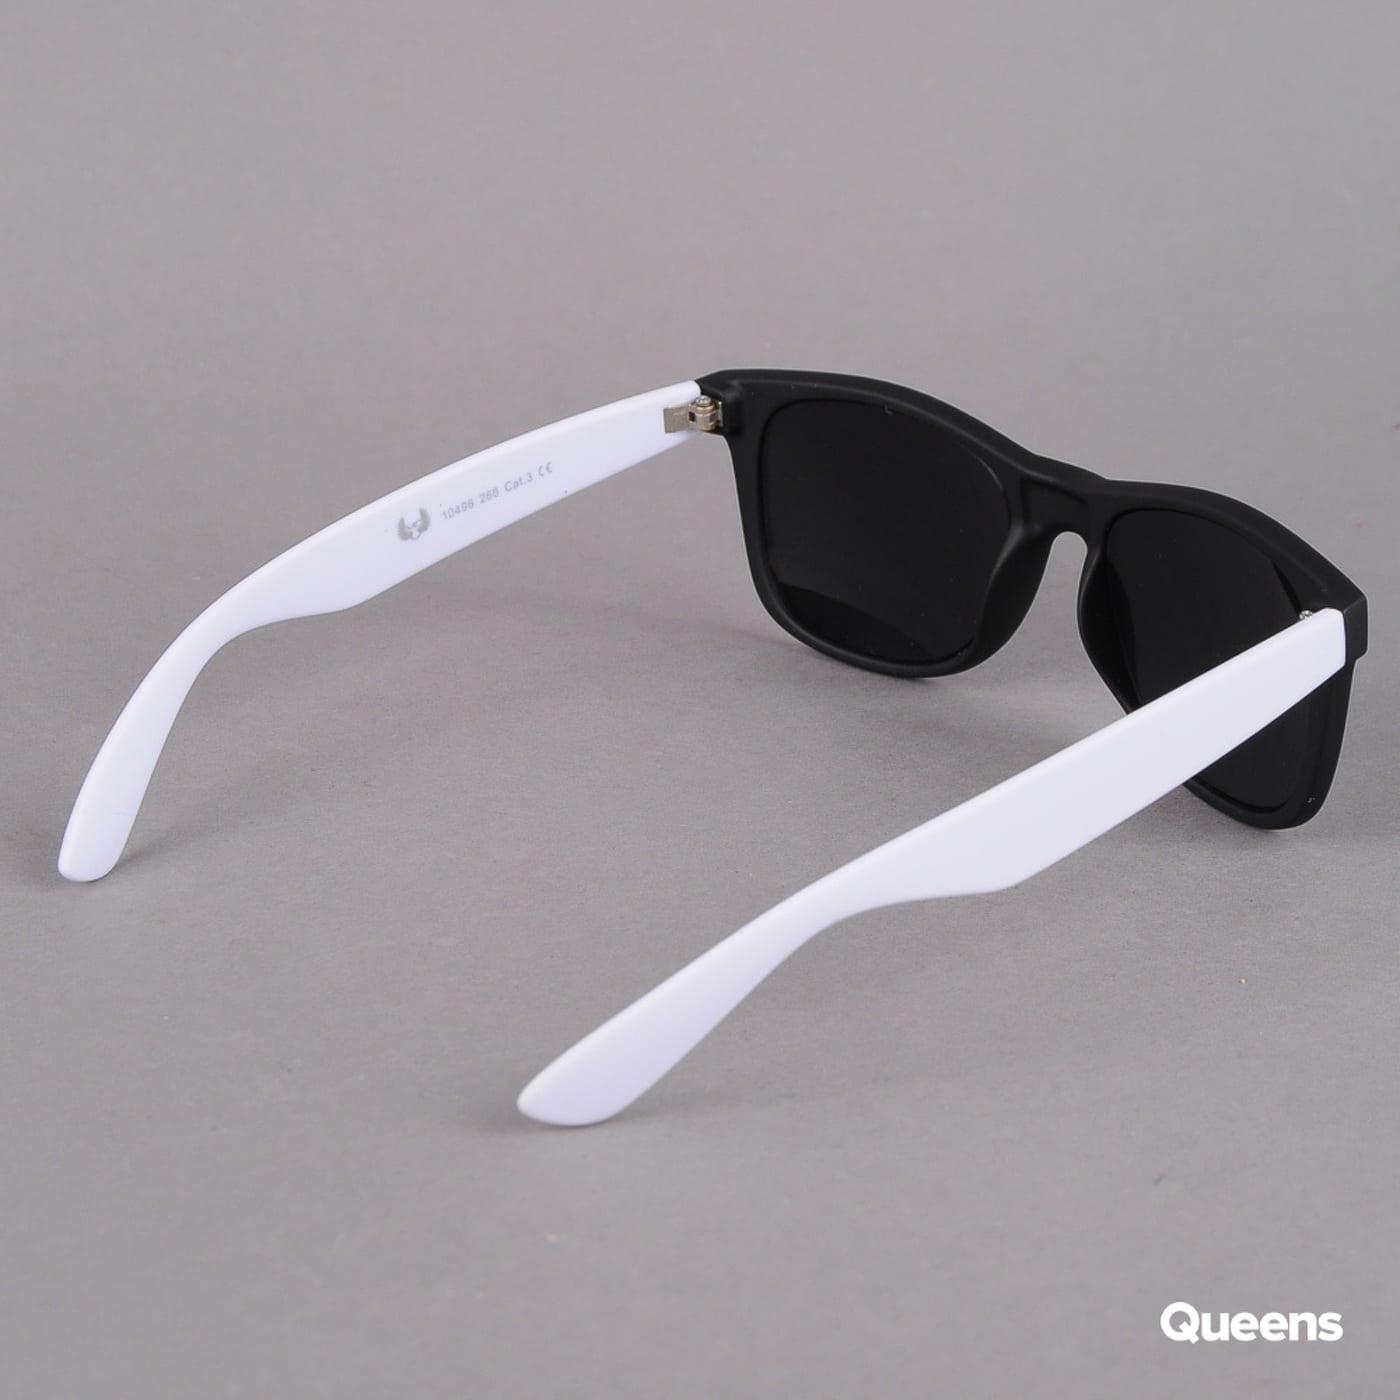 MD Sunglasses Likoma Mirror schwarz / weiß / silber